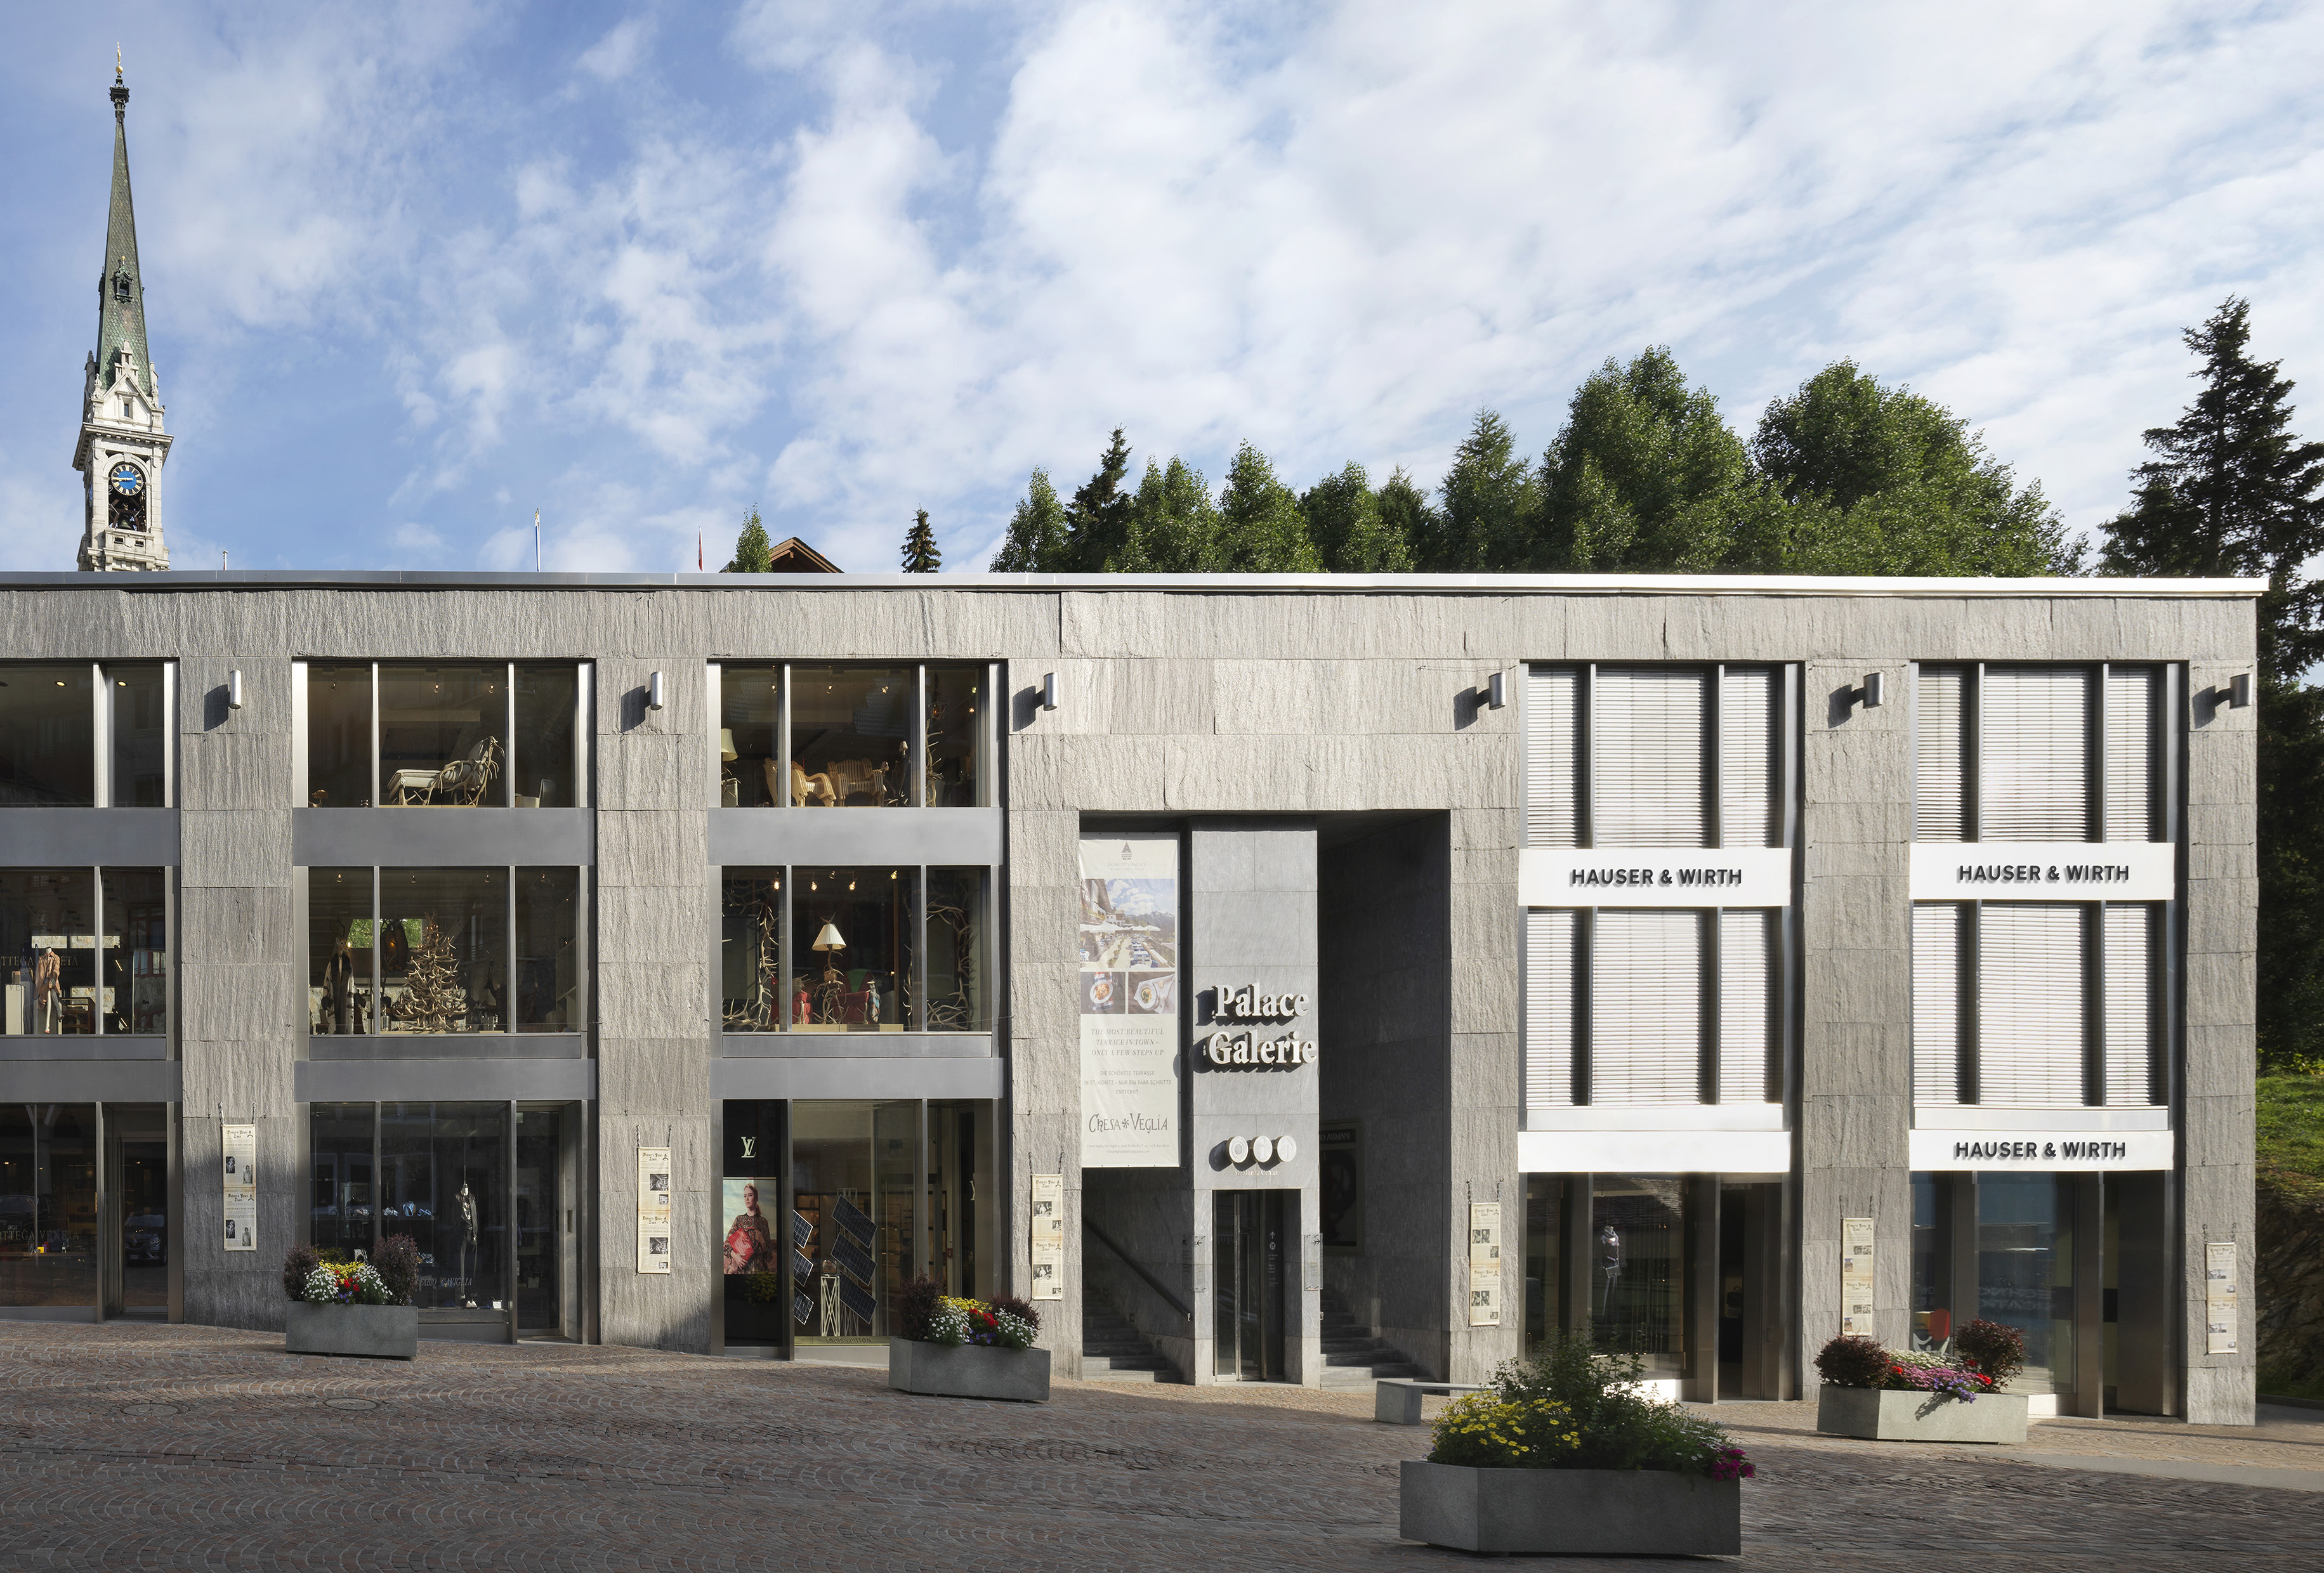 To the Mountains! Hauser & Wirth Will Open Gallery in St. Mortiz, Switzerland